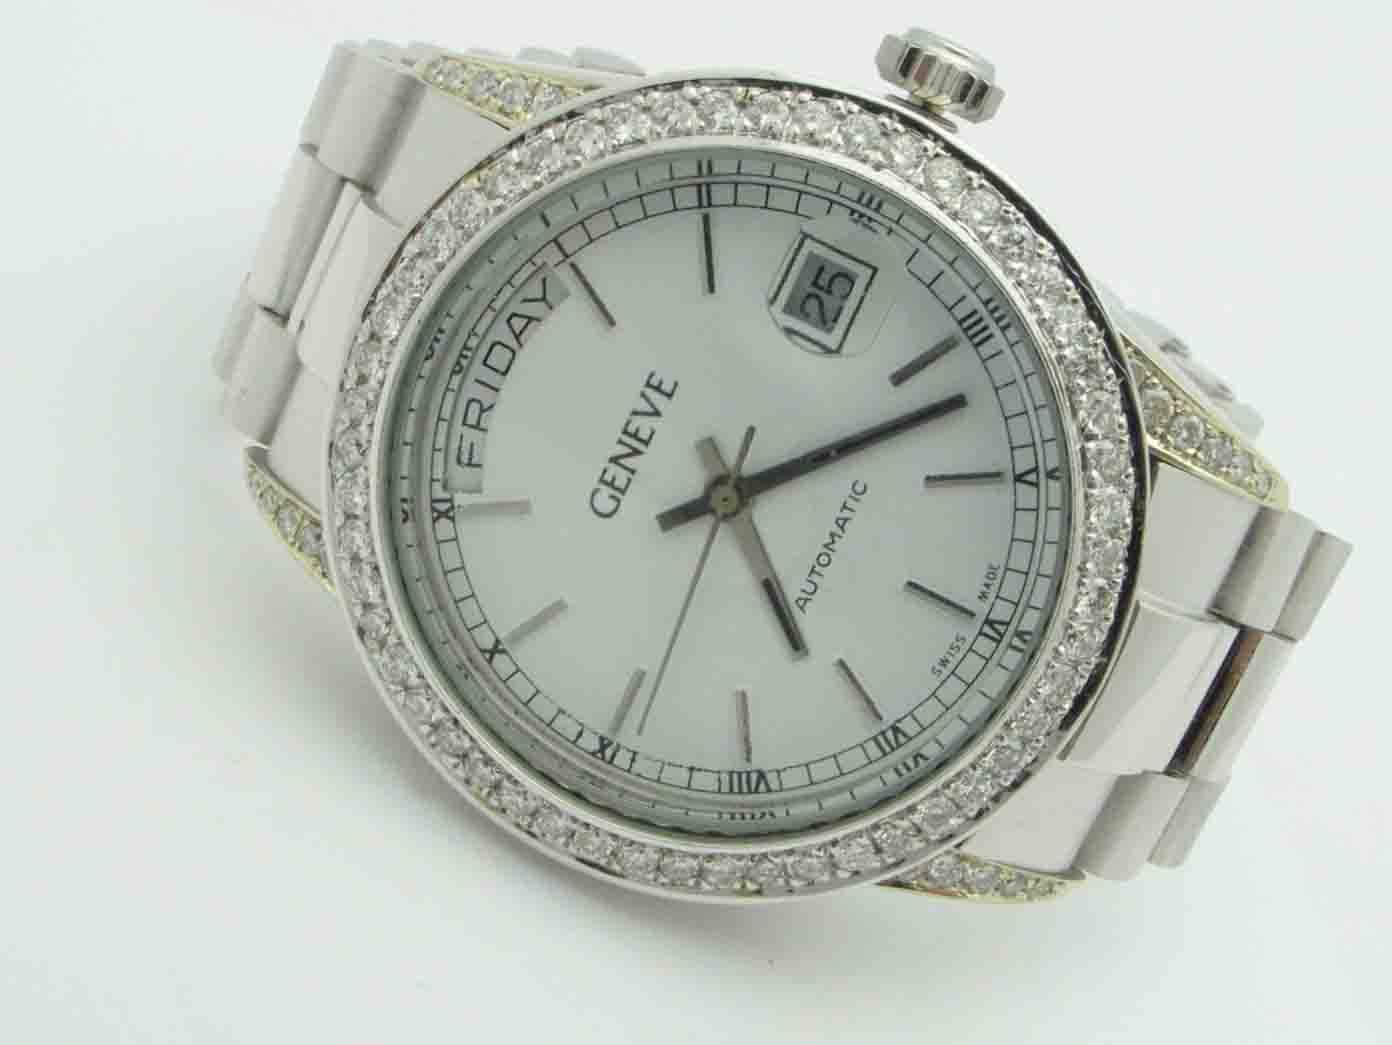 11802 18K WHITE GOLD DIAMOND GENEVA WATCH